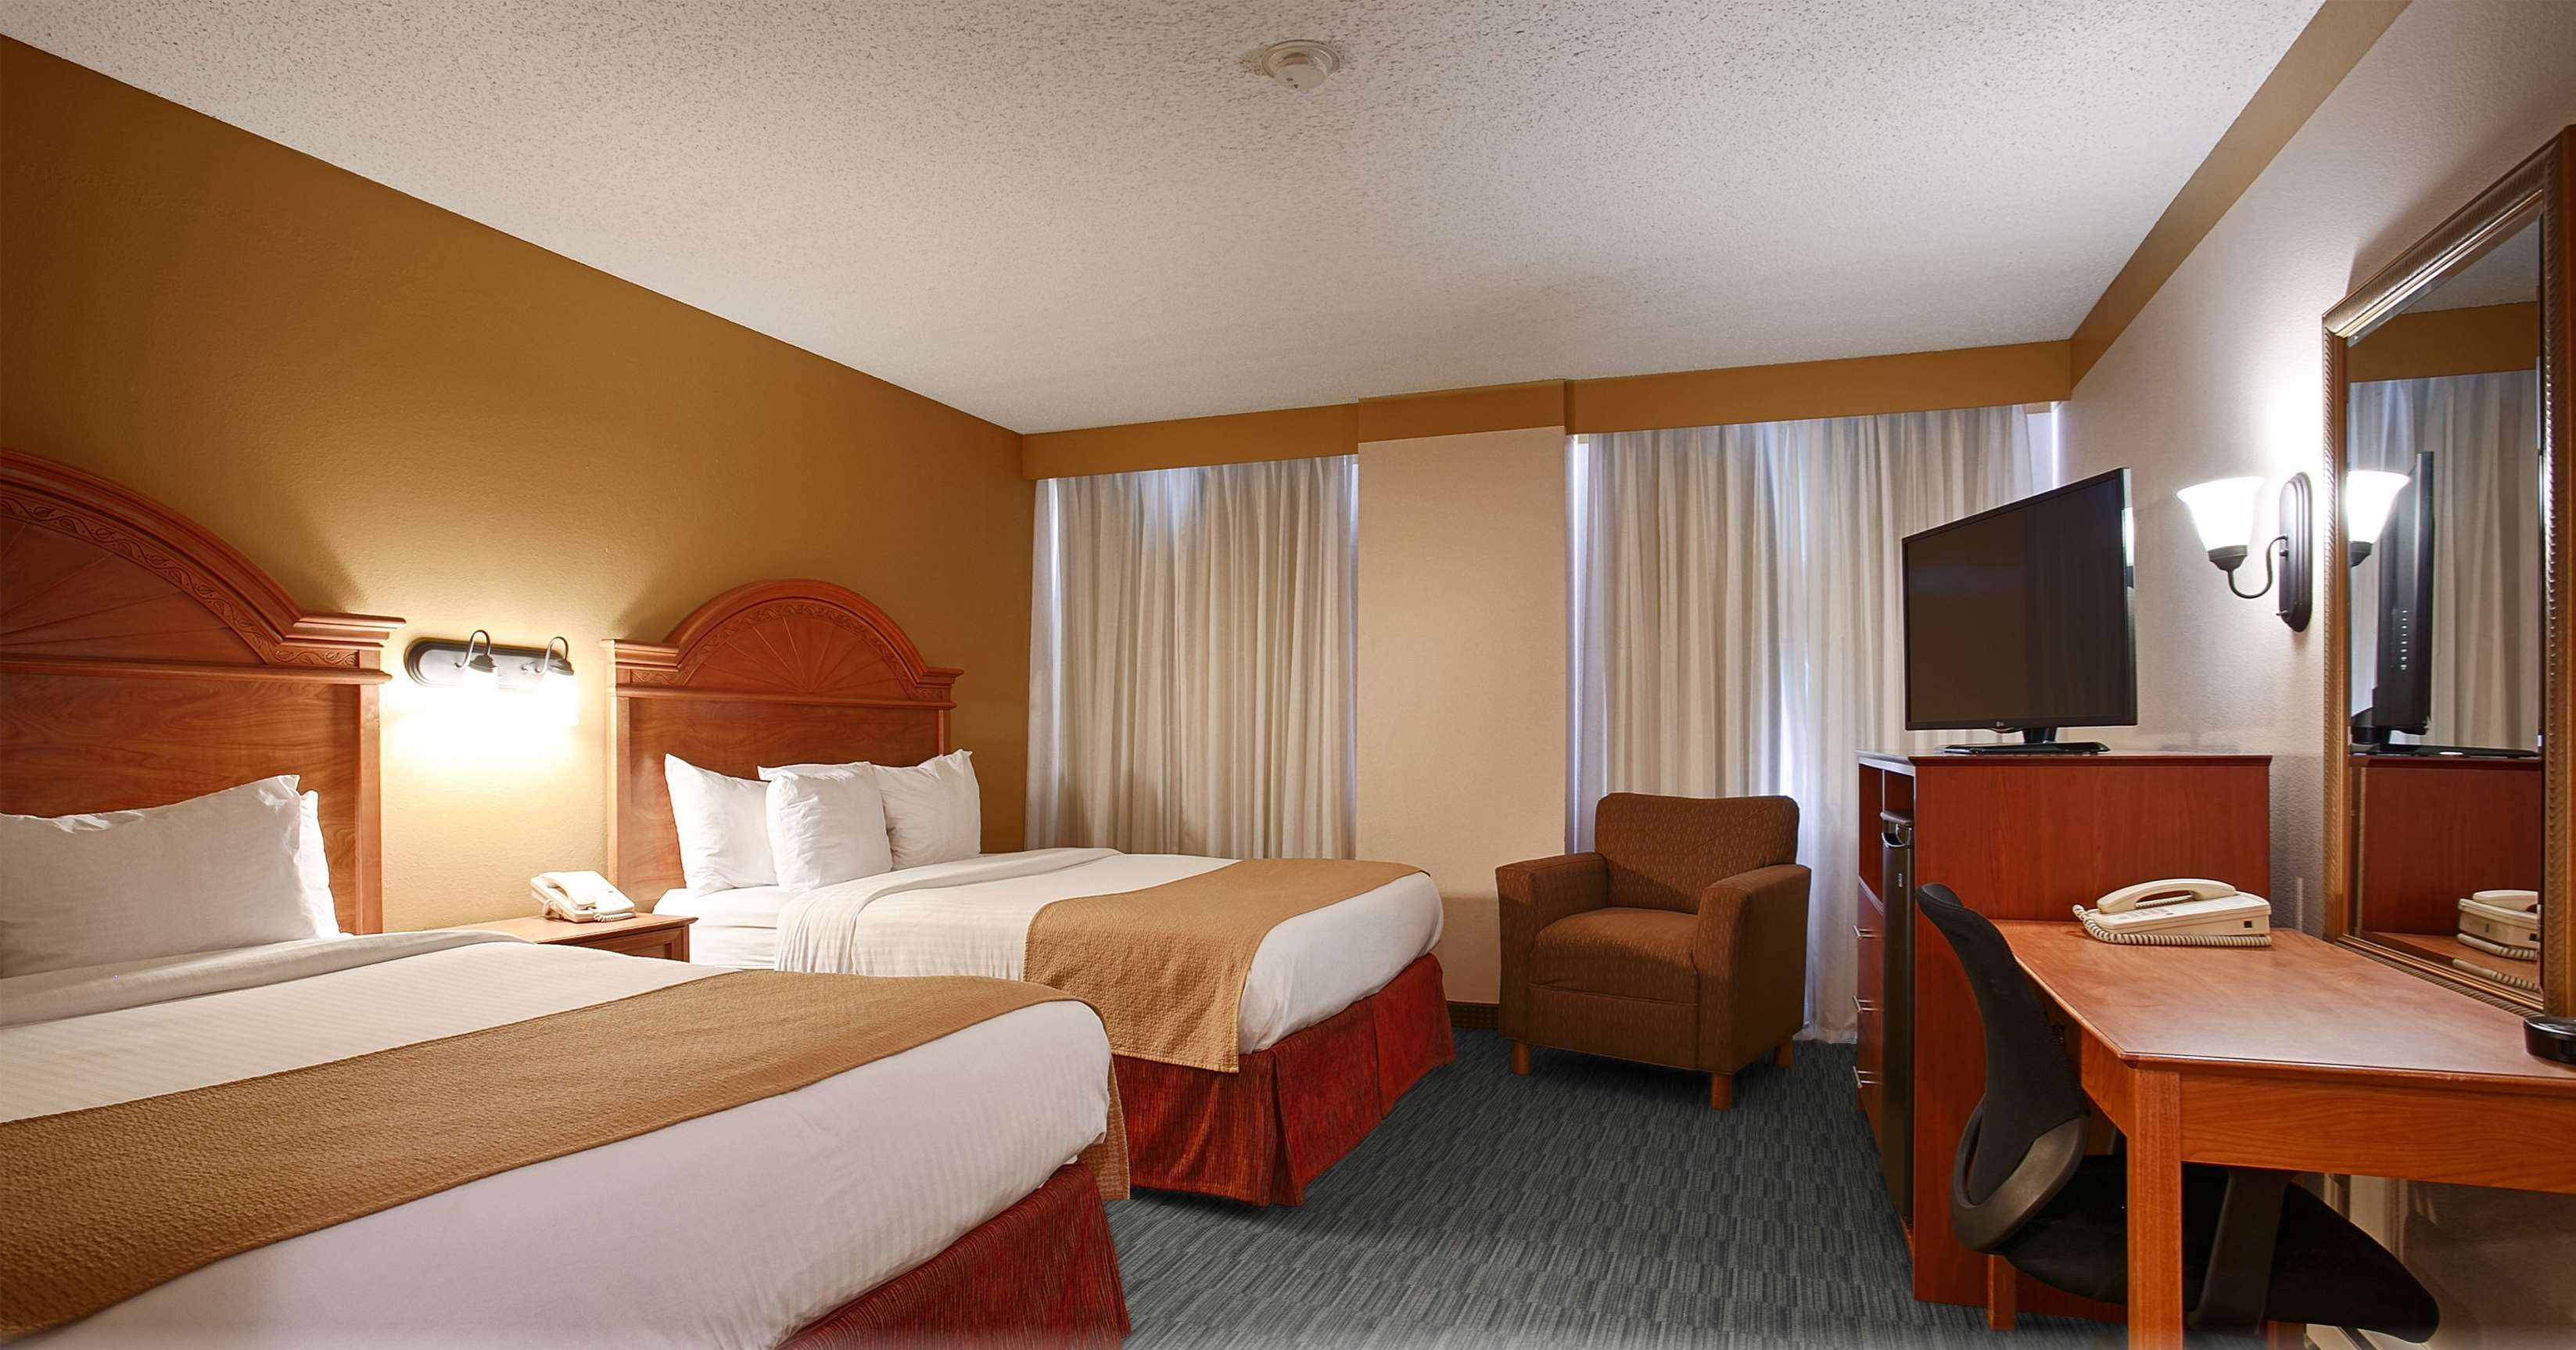 Best Western Plus Como Park Hotel image 22